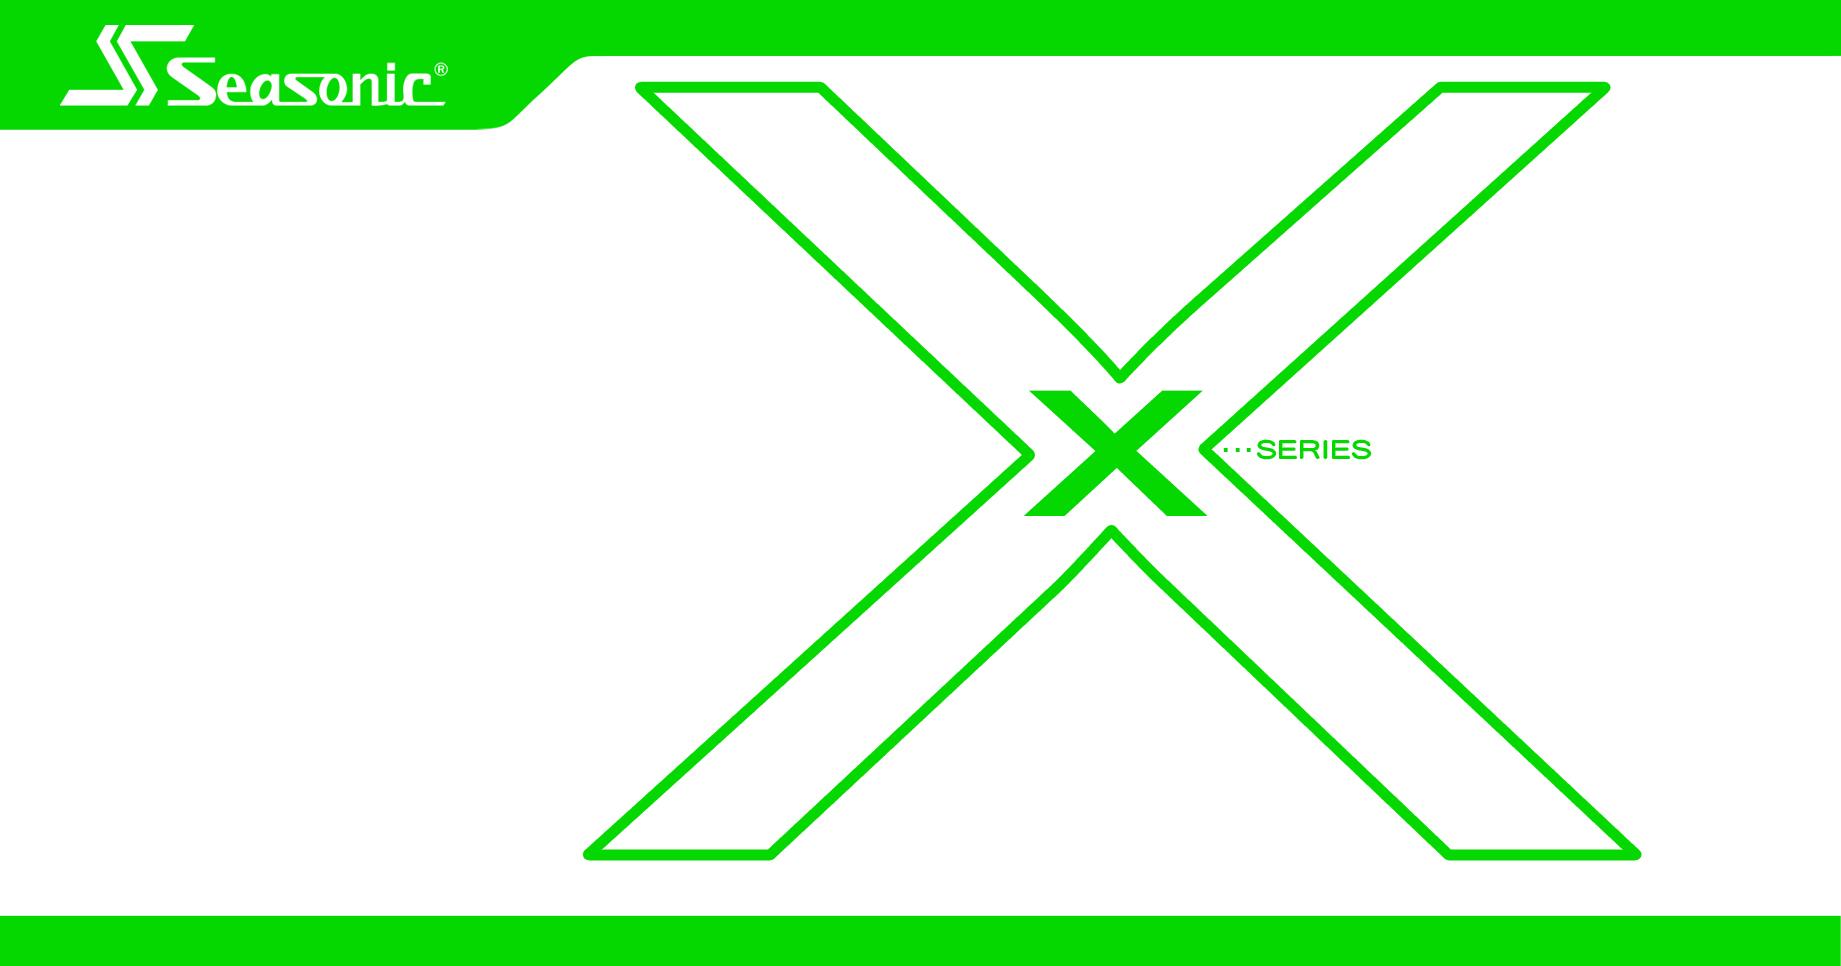 seasonic_x_series_white_green_by_jammo2k5-d54mcs3.jpg